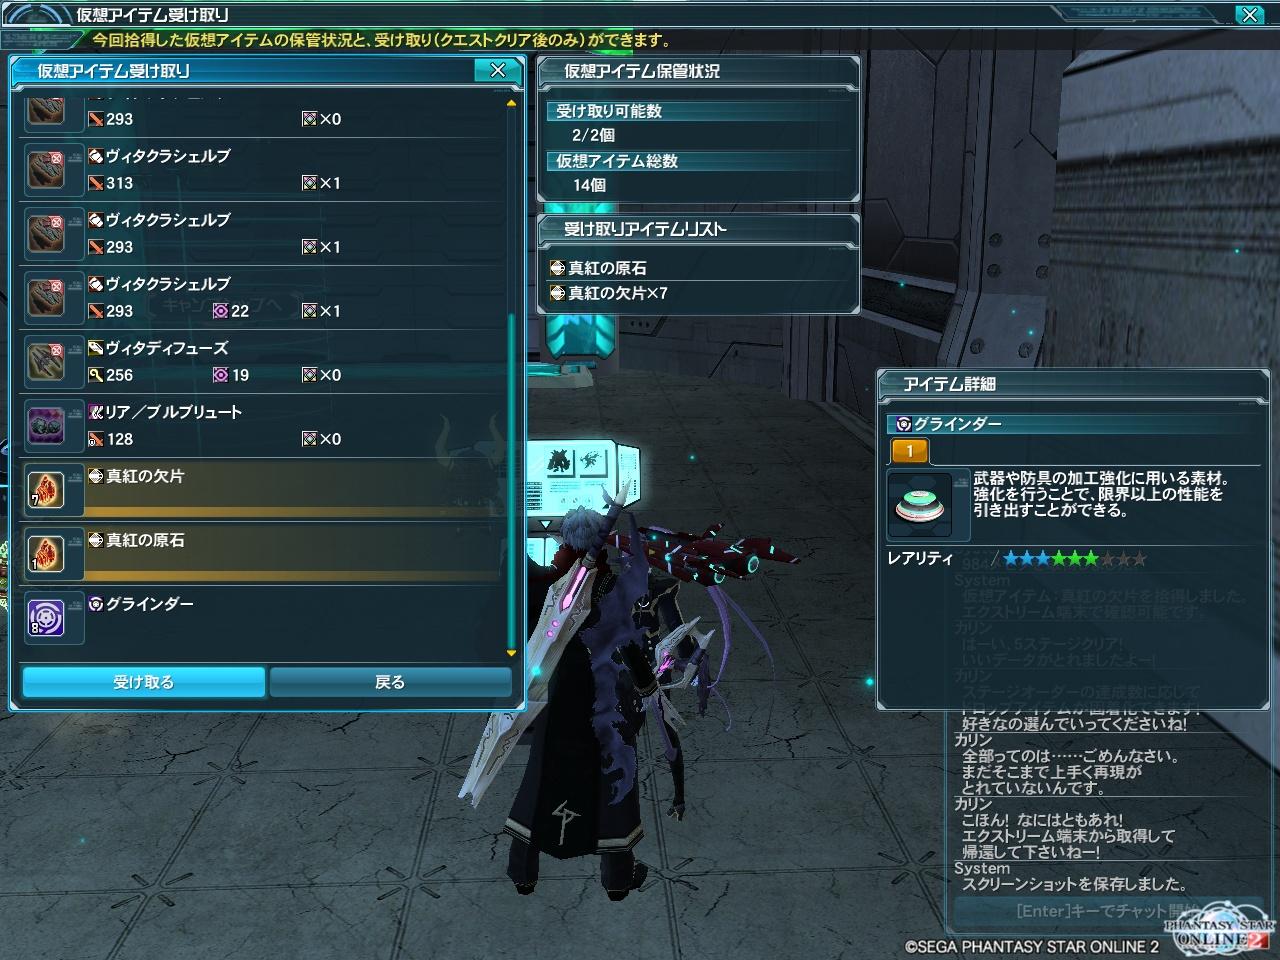 pso20130607_221745_002.jpg